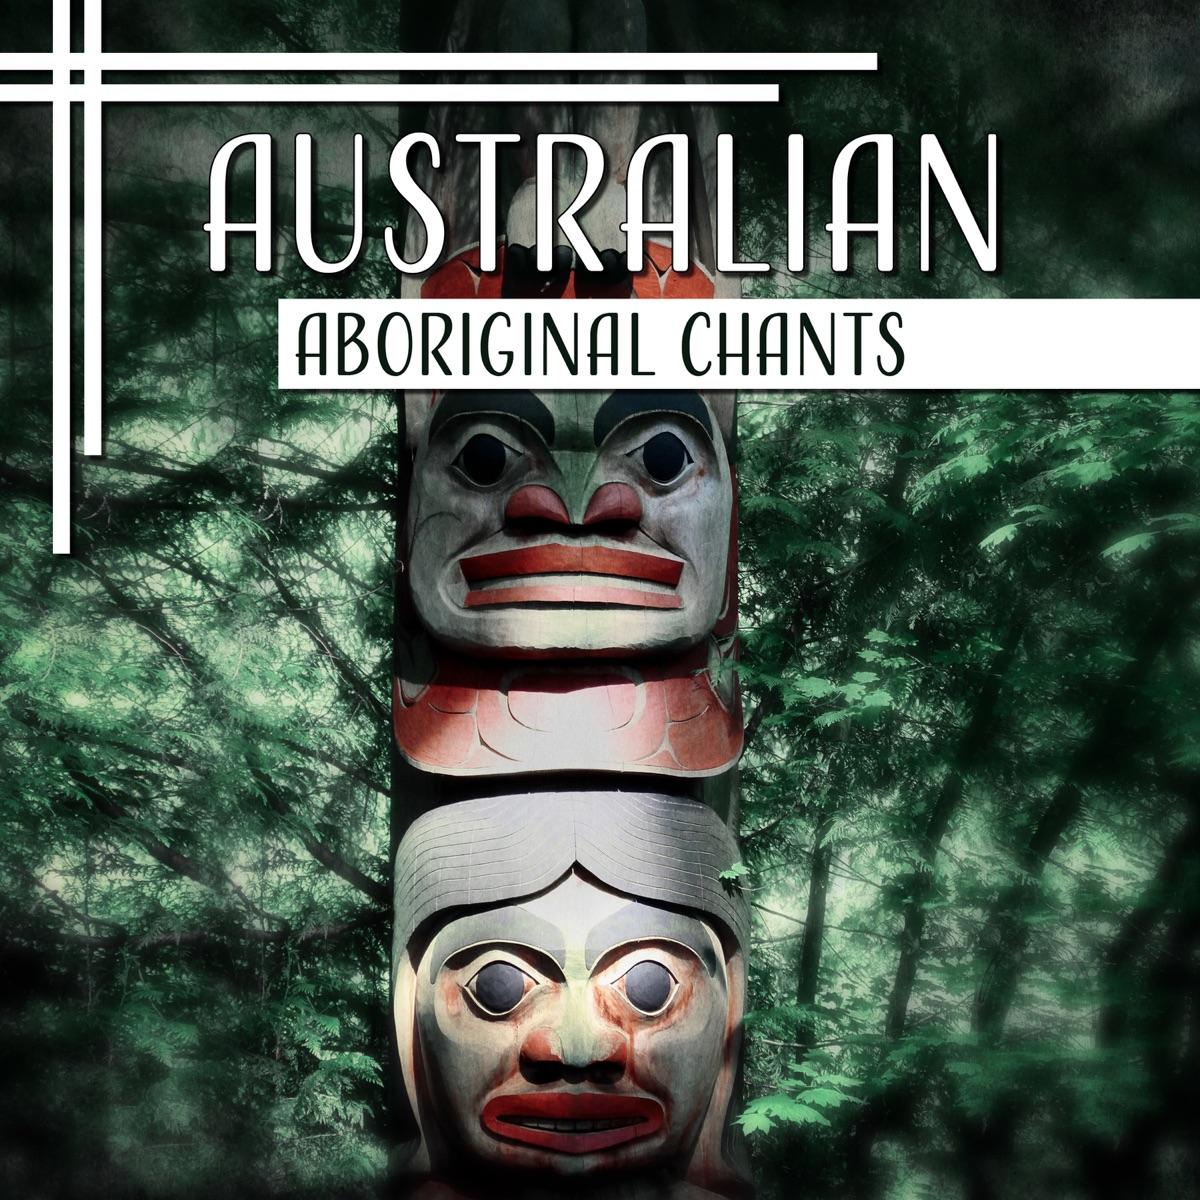 Australian Aboriginal Chants: Didgeridoo Music for Meditation